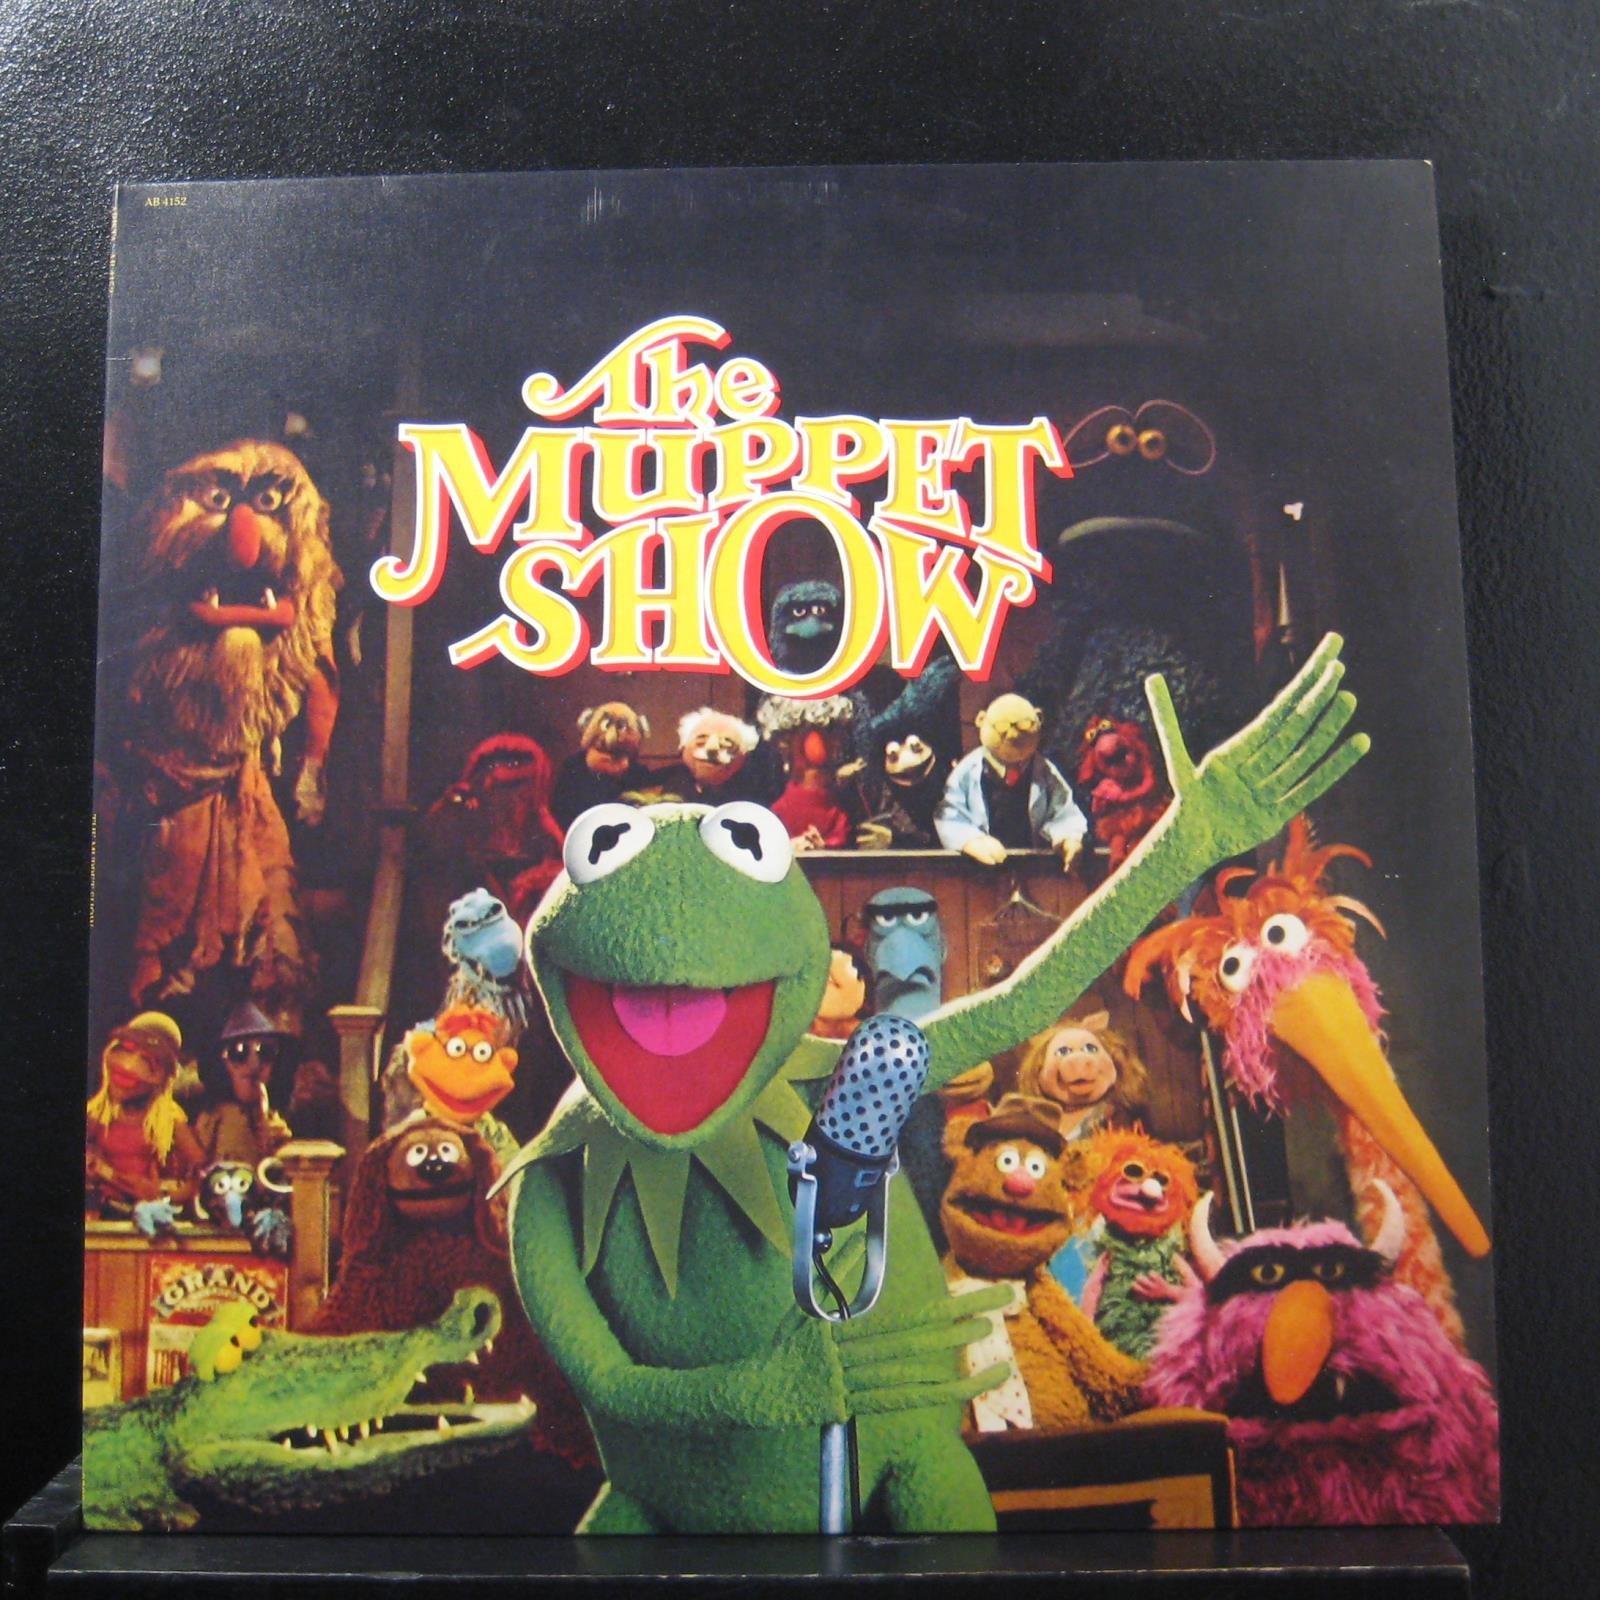 The Muppet Show [LP VINYL]